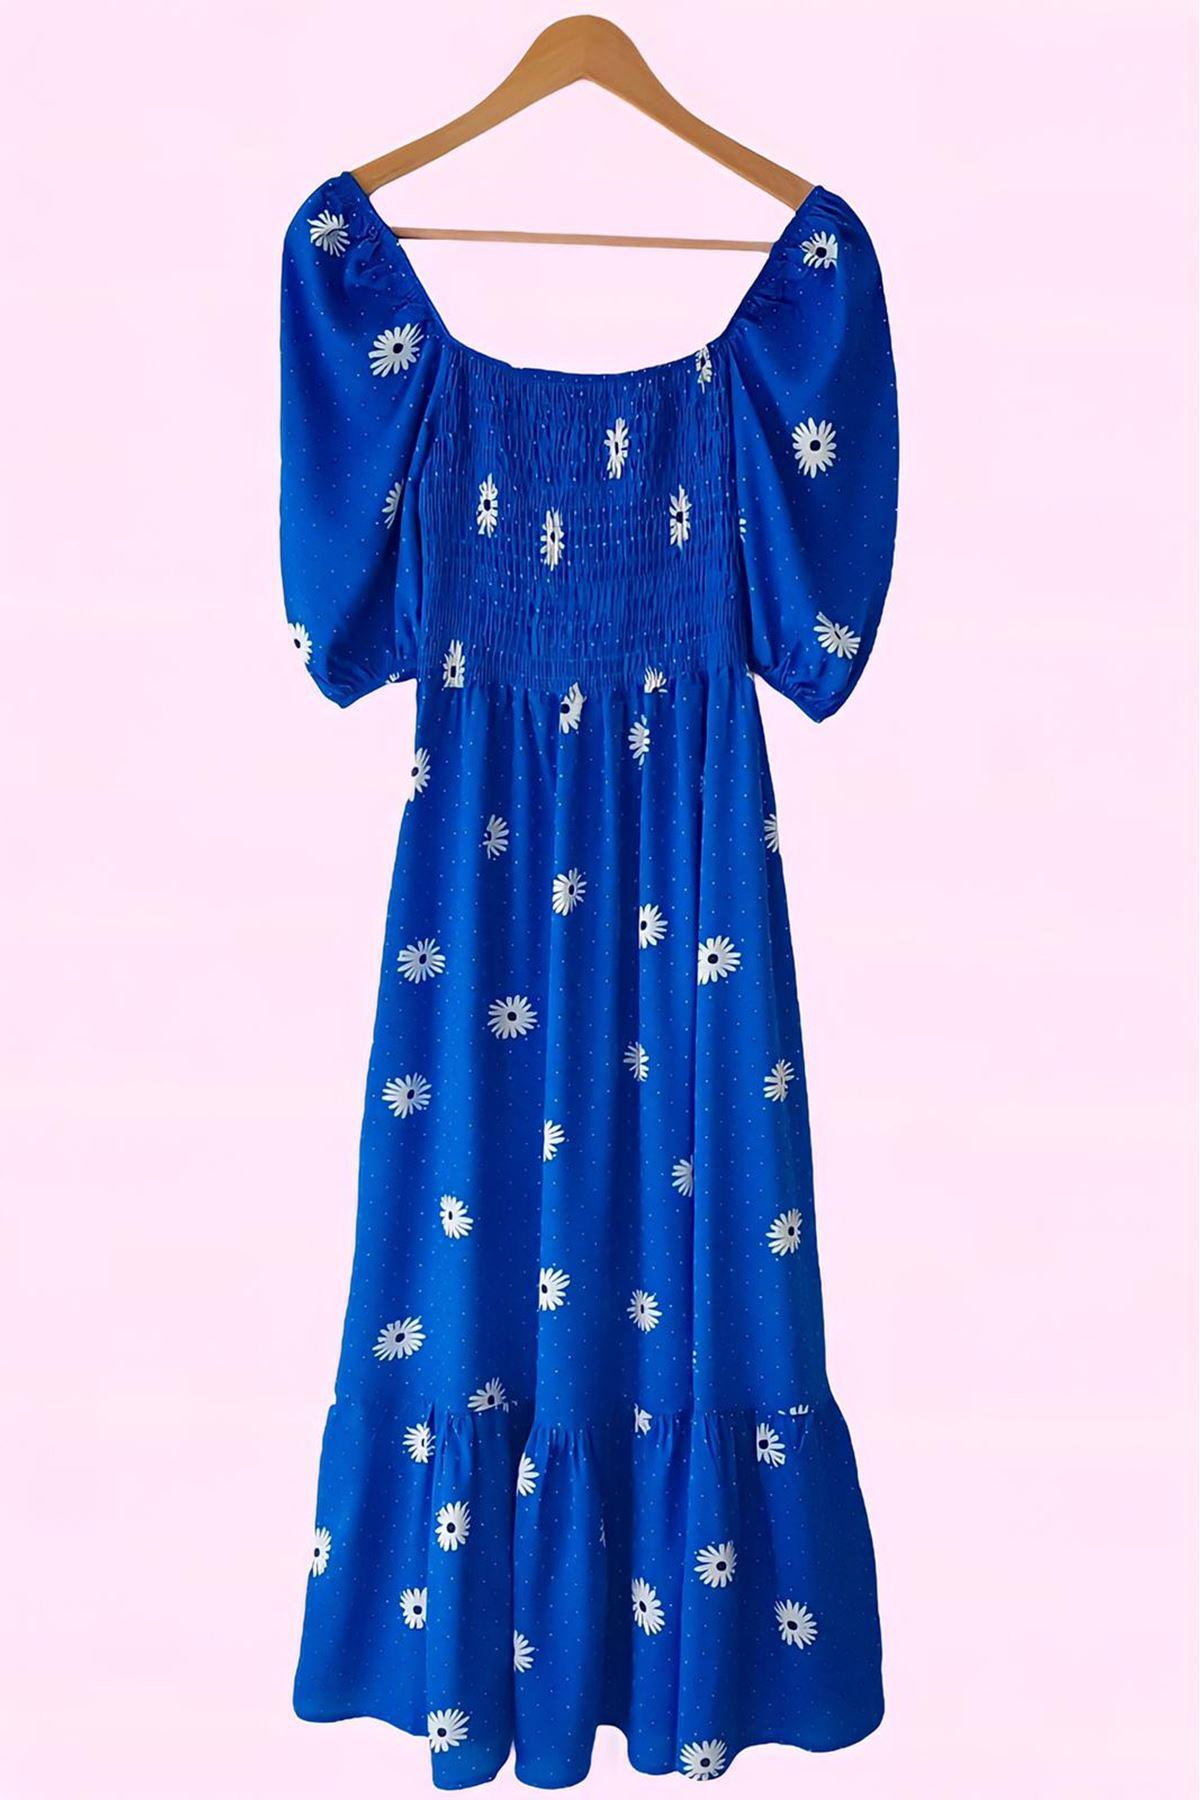 Papatya Desen Gipeli Elbise - MAVİ